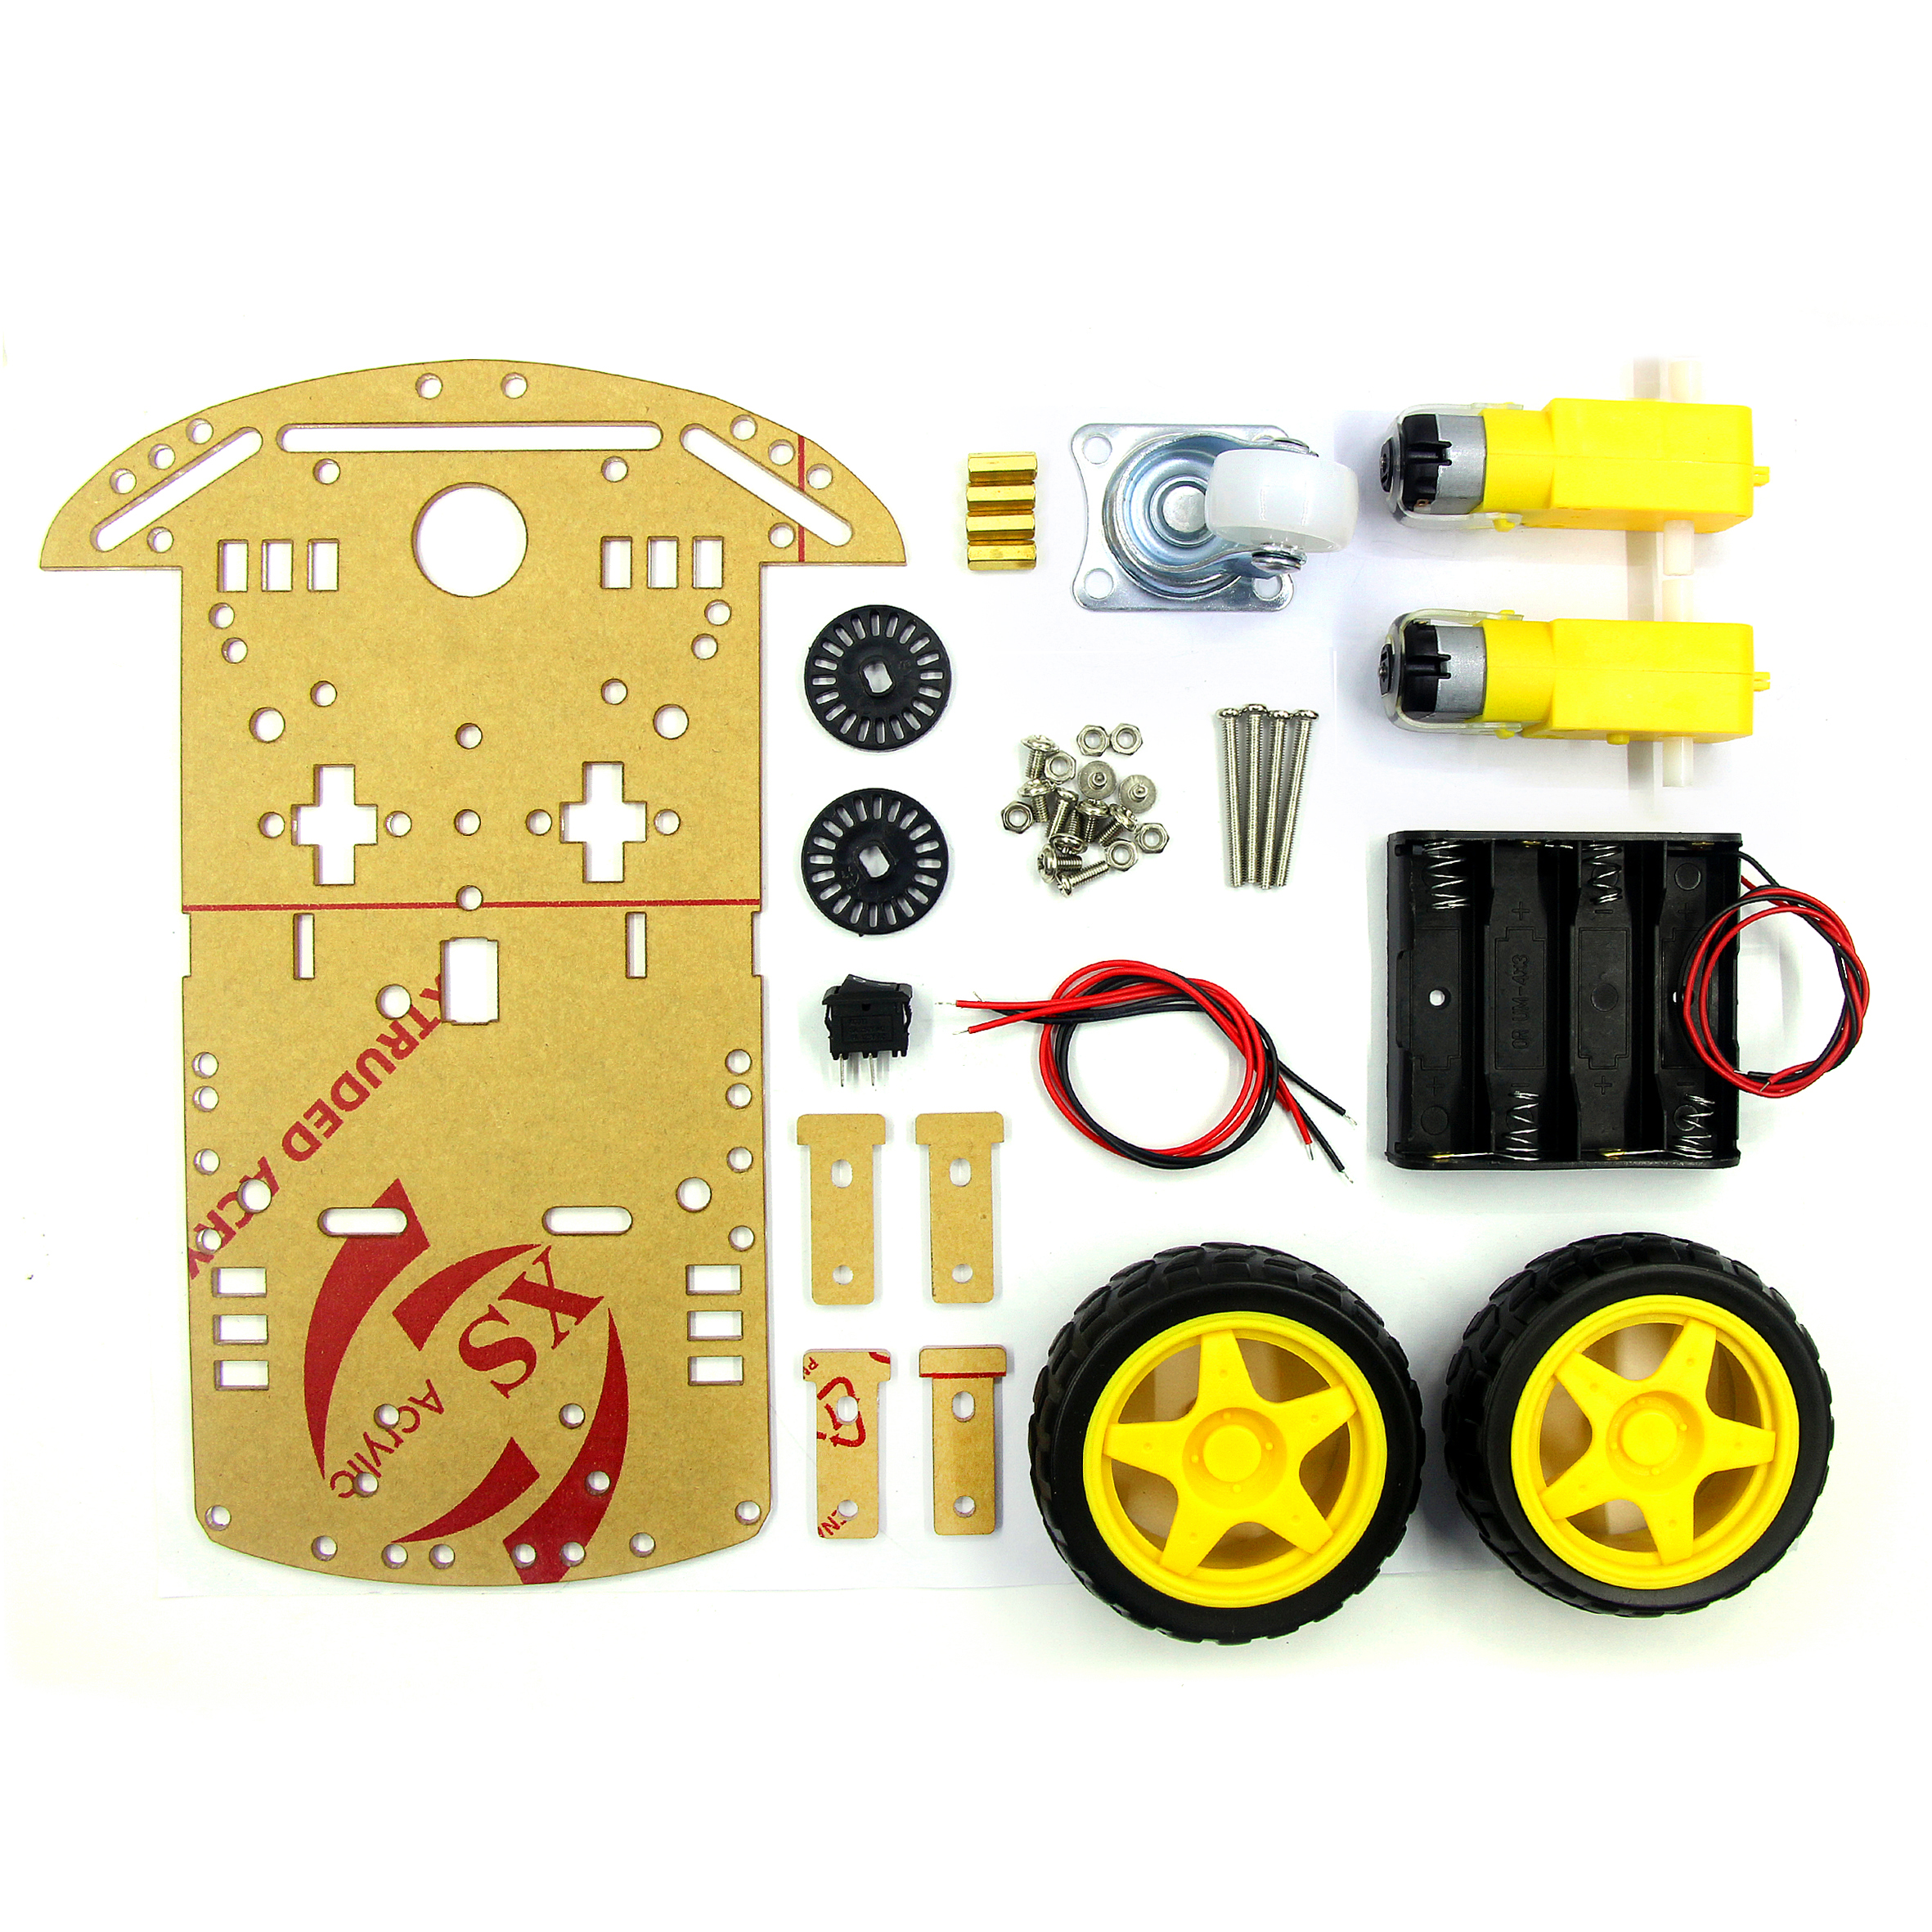 Starter Kit Smart Roboter Auto Chassis Kit Motor Geschwindigkeit Encoder Batterie Box 2WD 4WD Ultraschall Modul für arduino Diy Kit